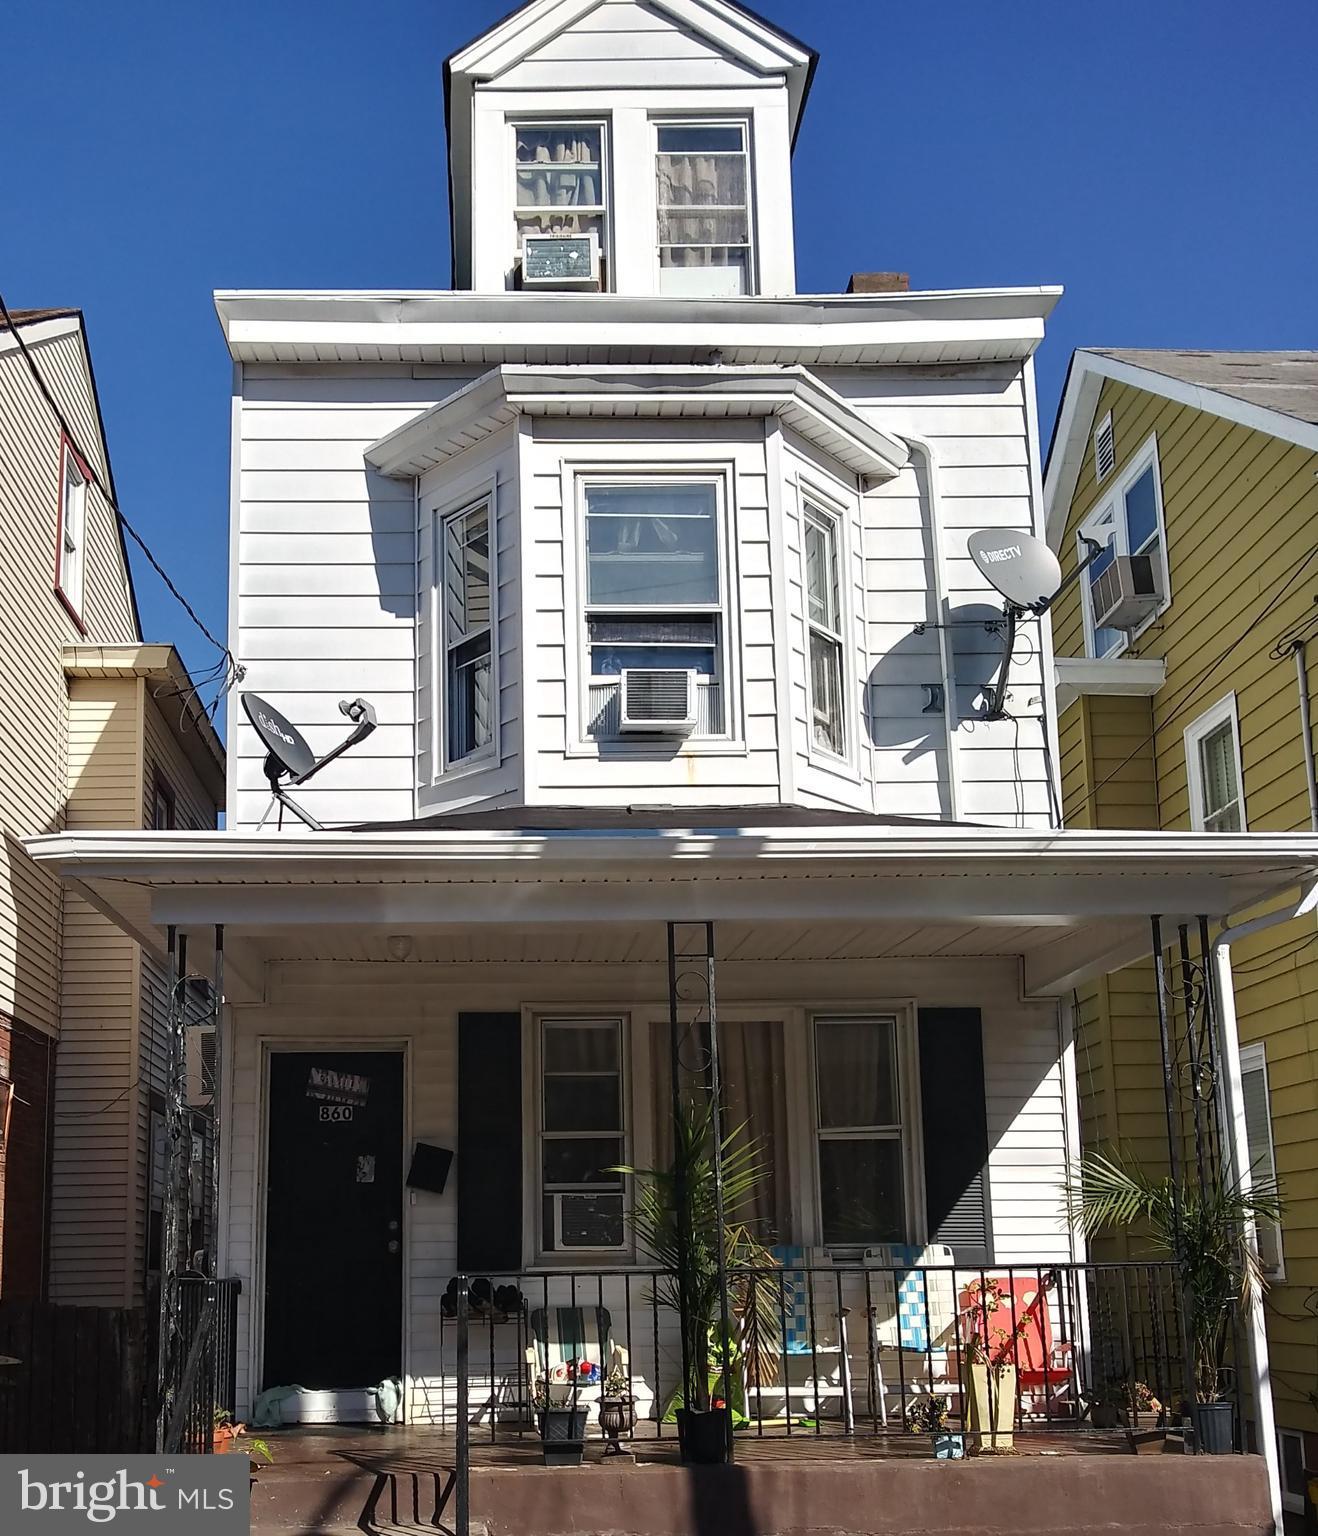 860 QUINTON AVENUE, TRENTON, NJ 08629